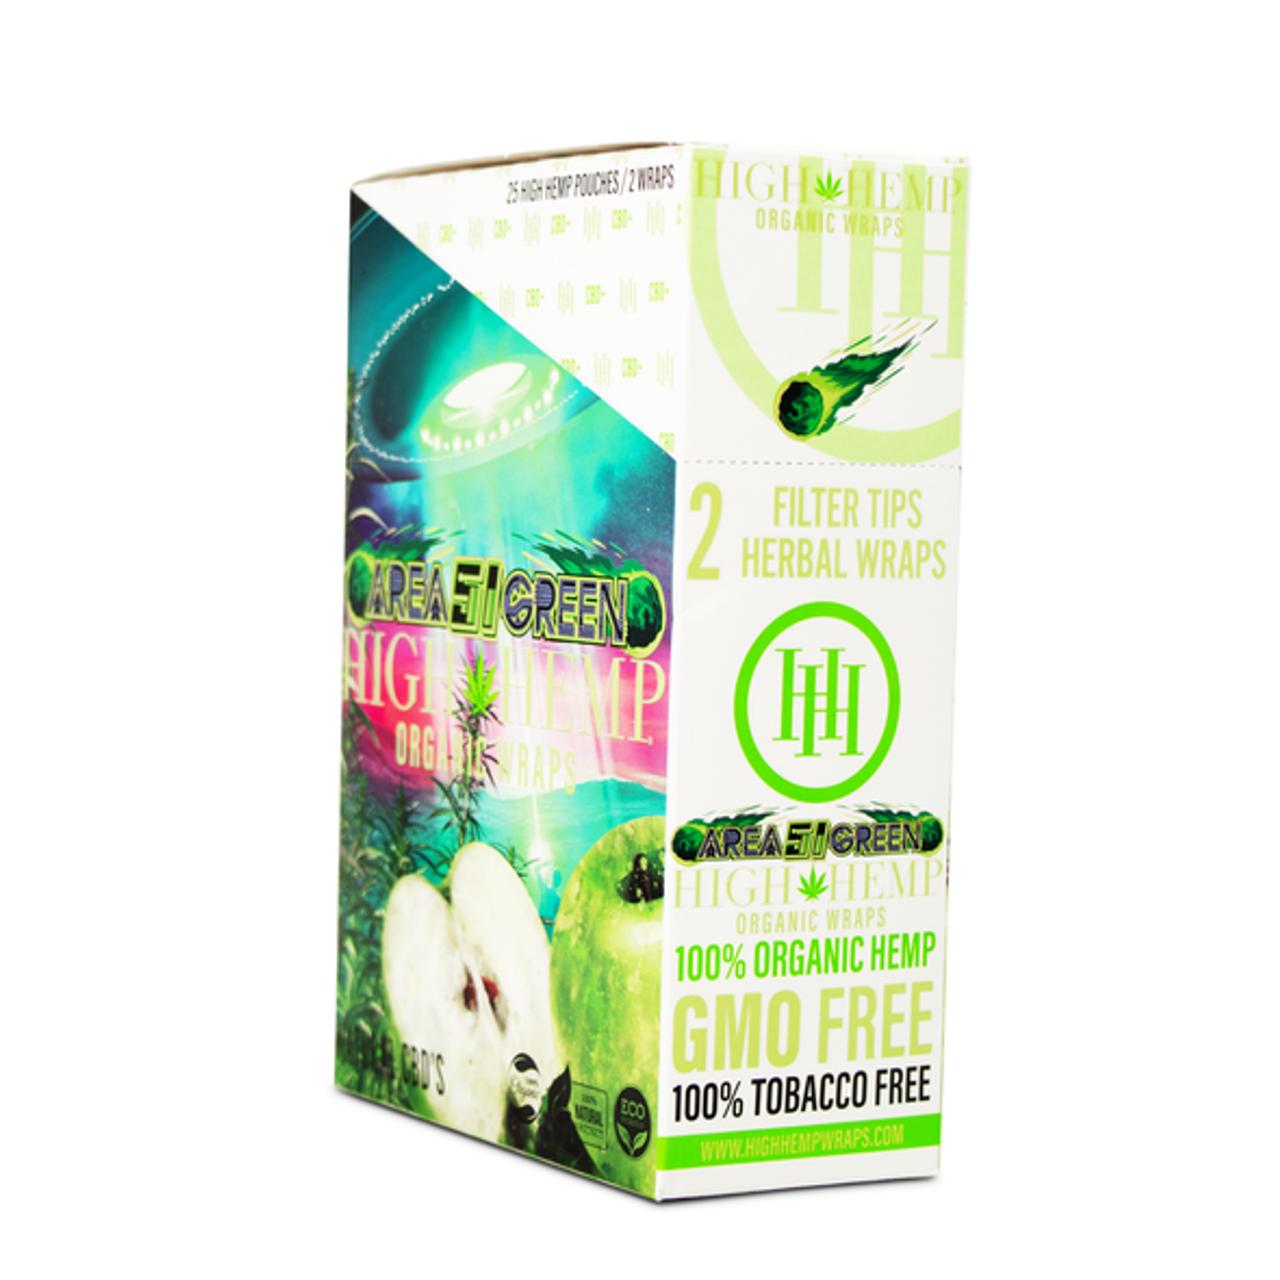 High Hemp High Hemp Organic Wraps 2ct - 25pk at The Cloud Supply